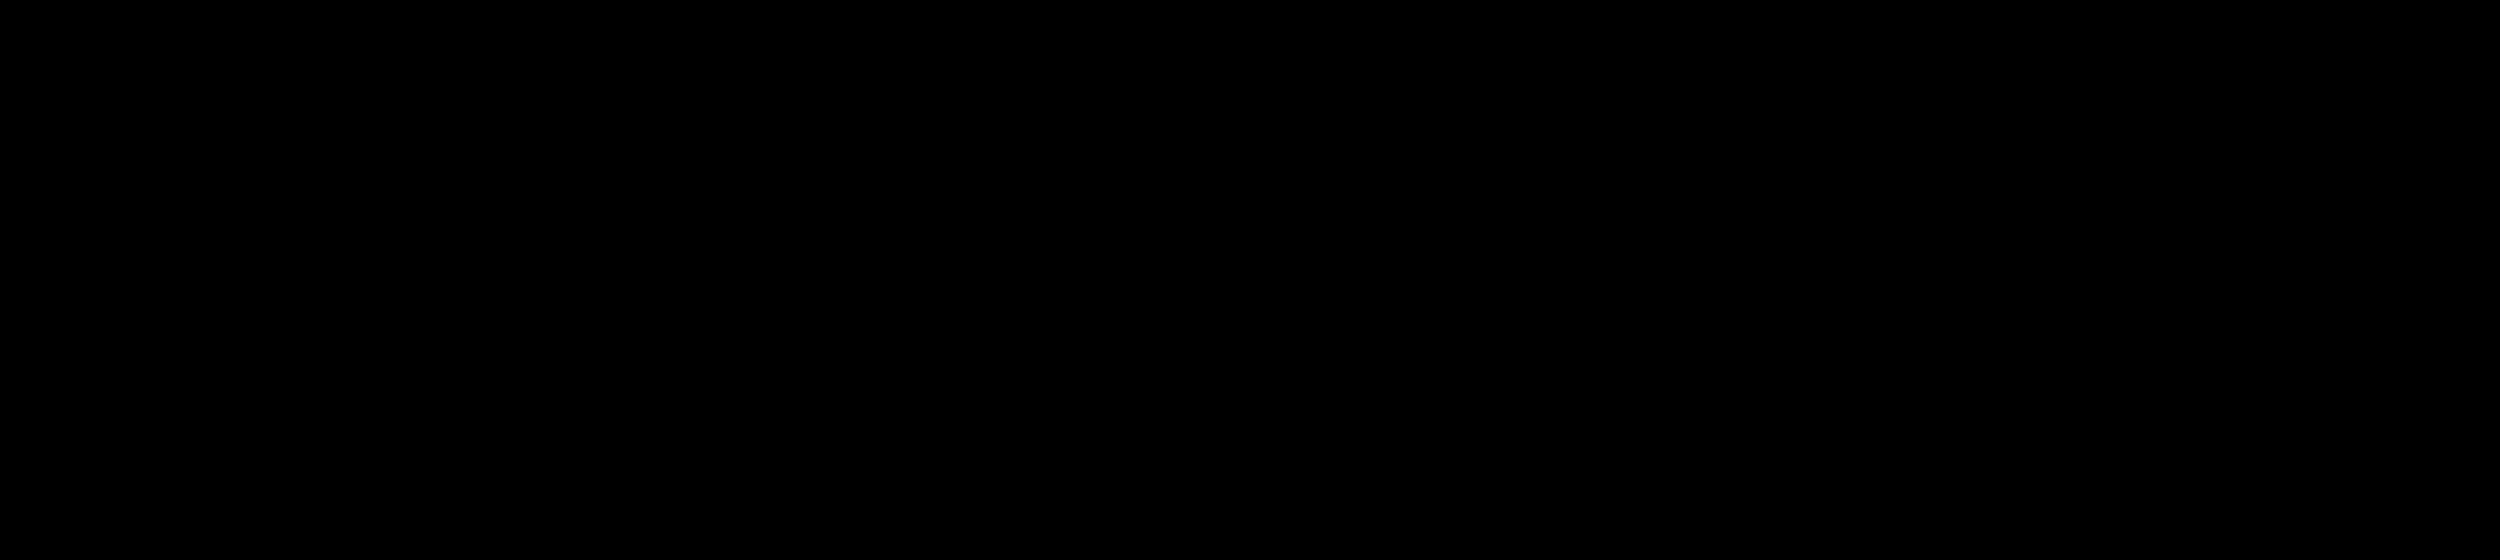 Nile_Lundgren_Team_Logo_Final_Tertiary_Black .png